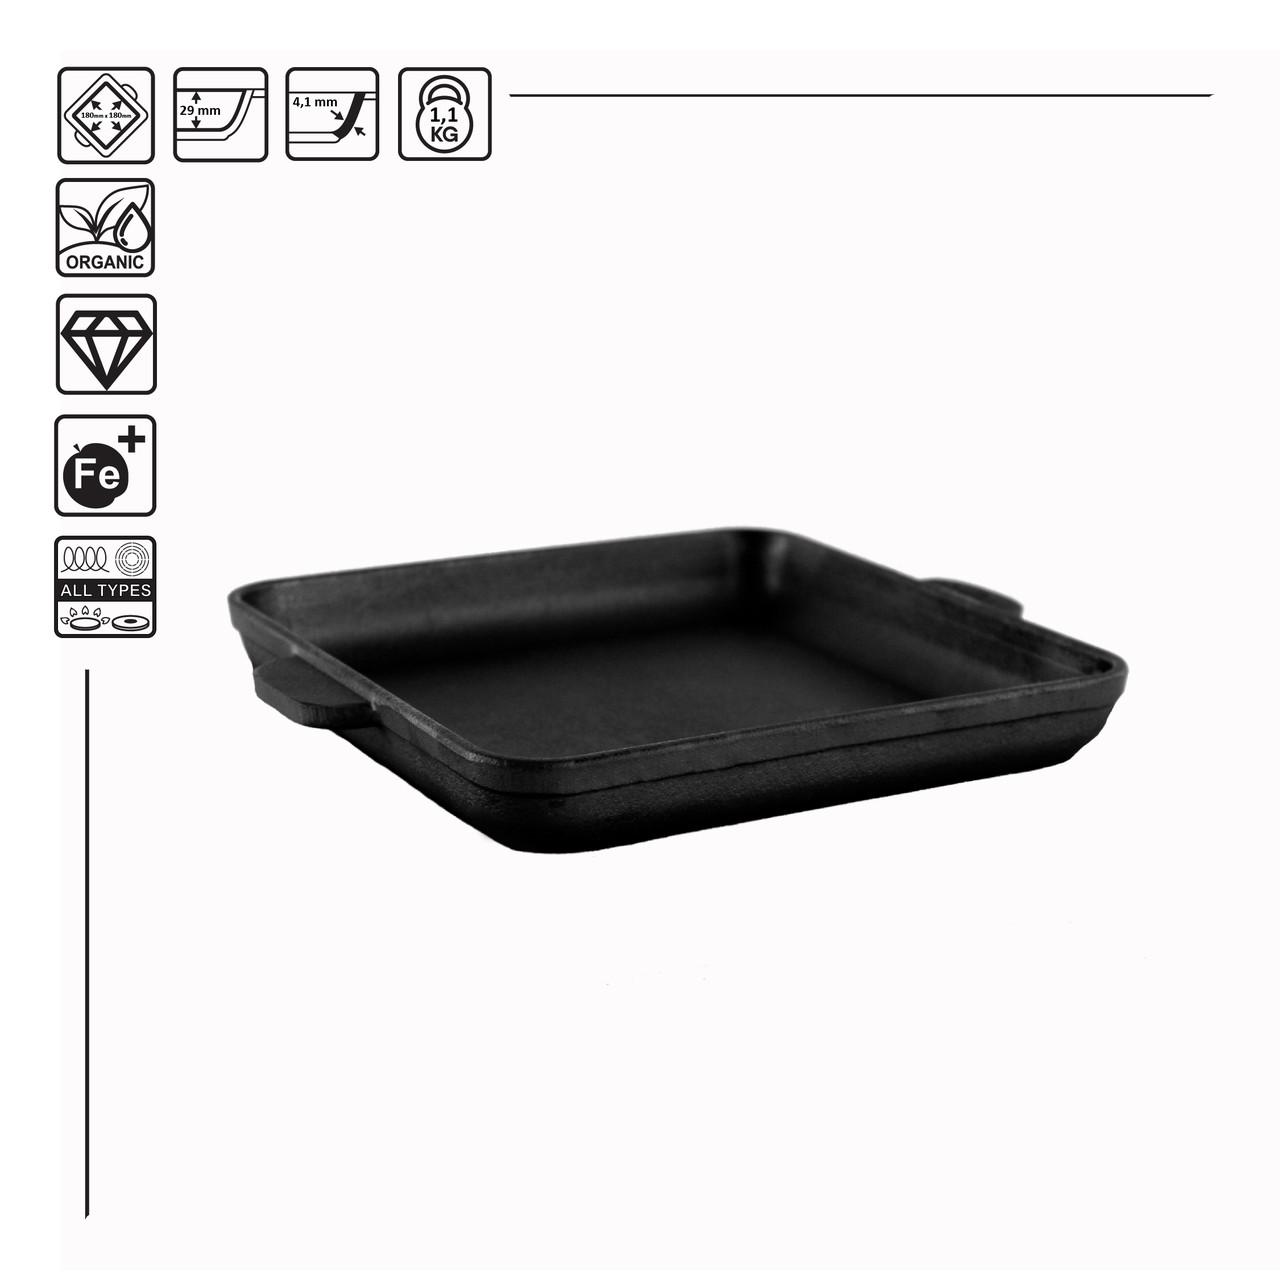 HoReCa, Сковорода чавунна квадратна BRIZOLL 180х180х25 мм